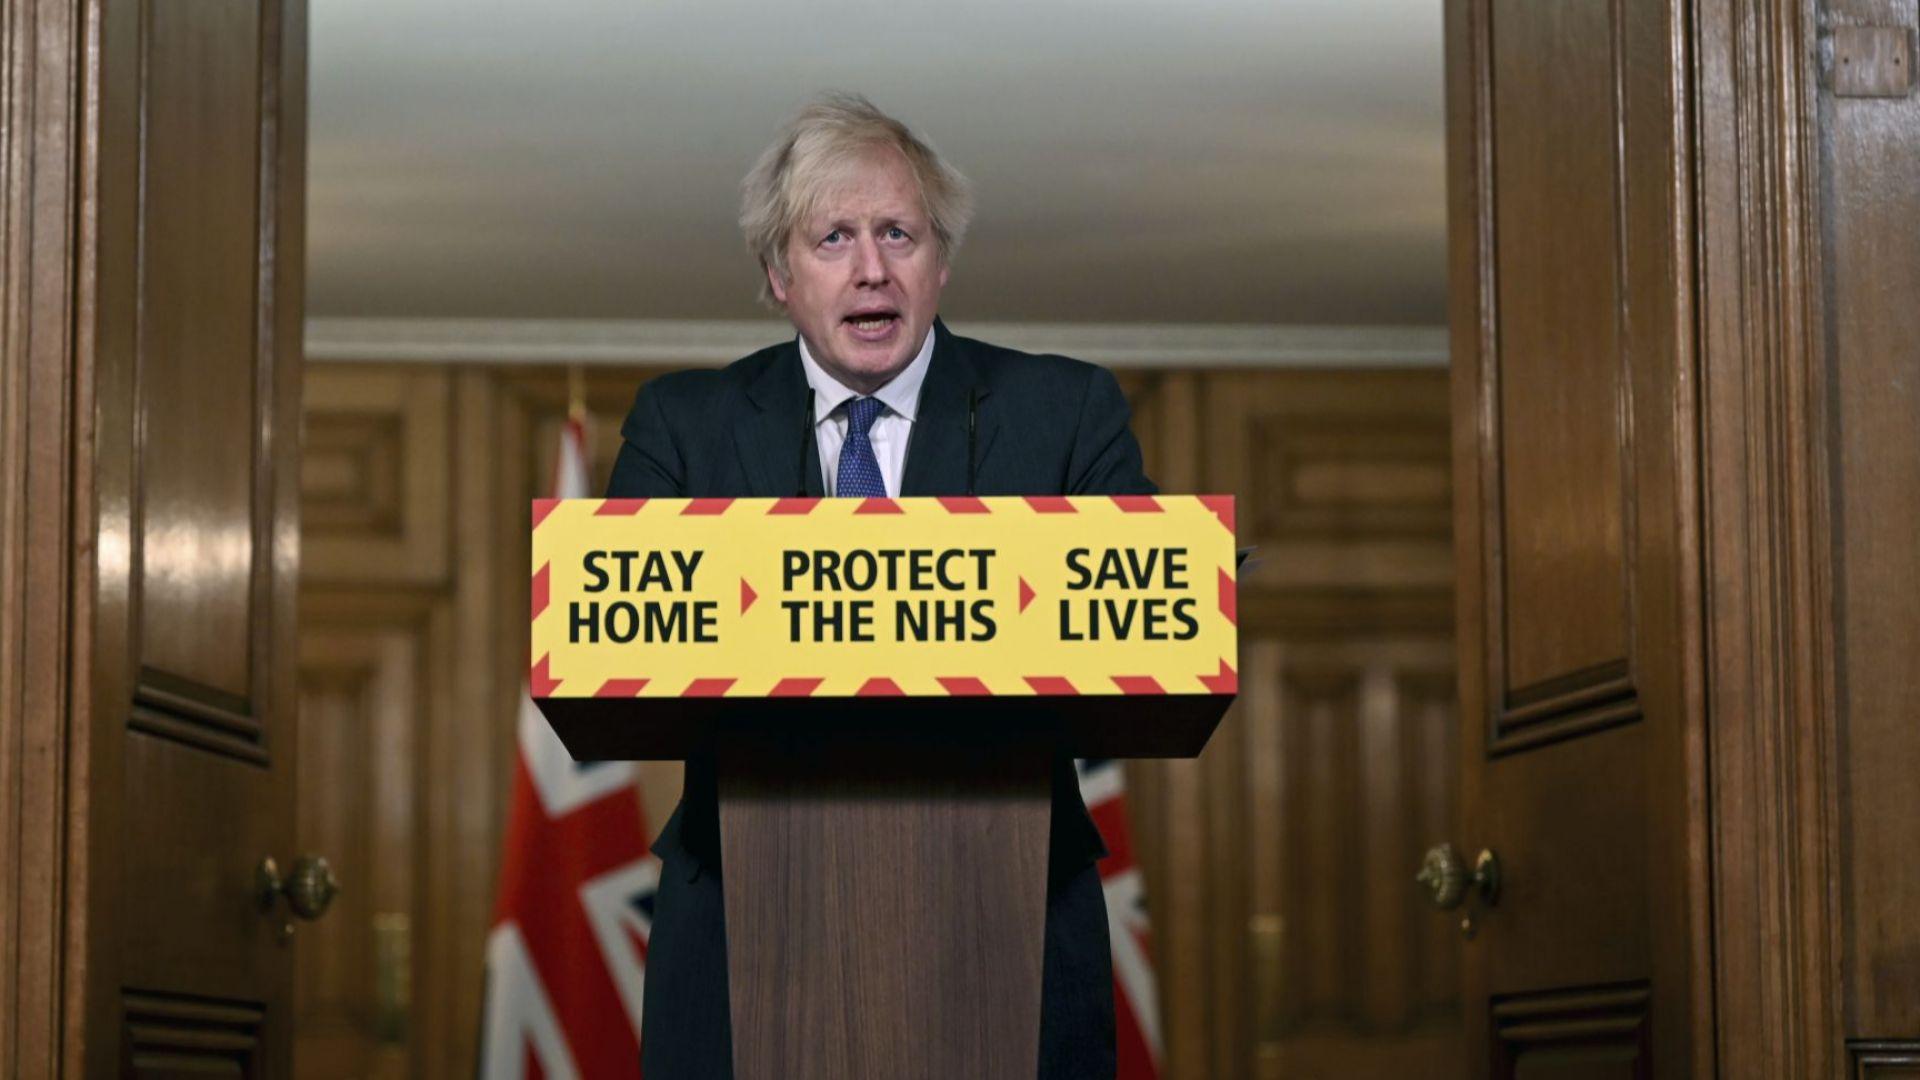 Джонсън призова за глобален договор за прозрачност при пандемии